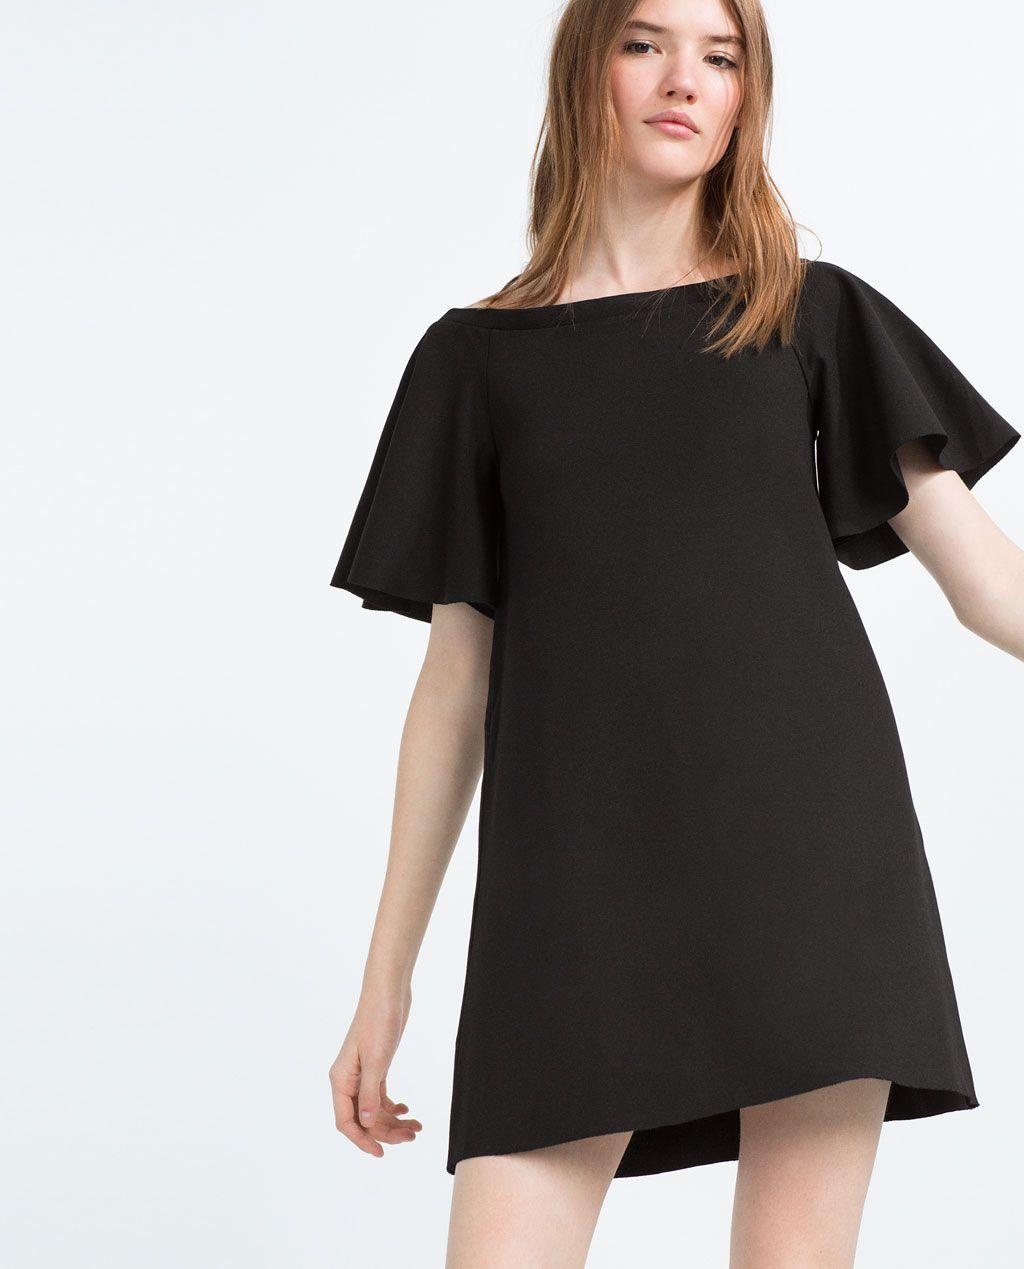 2e049ac9 Image 2 of FLOUNCE SLEEVE DRESS from Zara | Things to Wear | Dresses ...